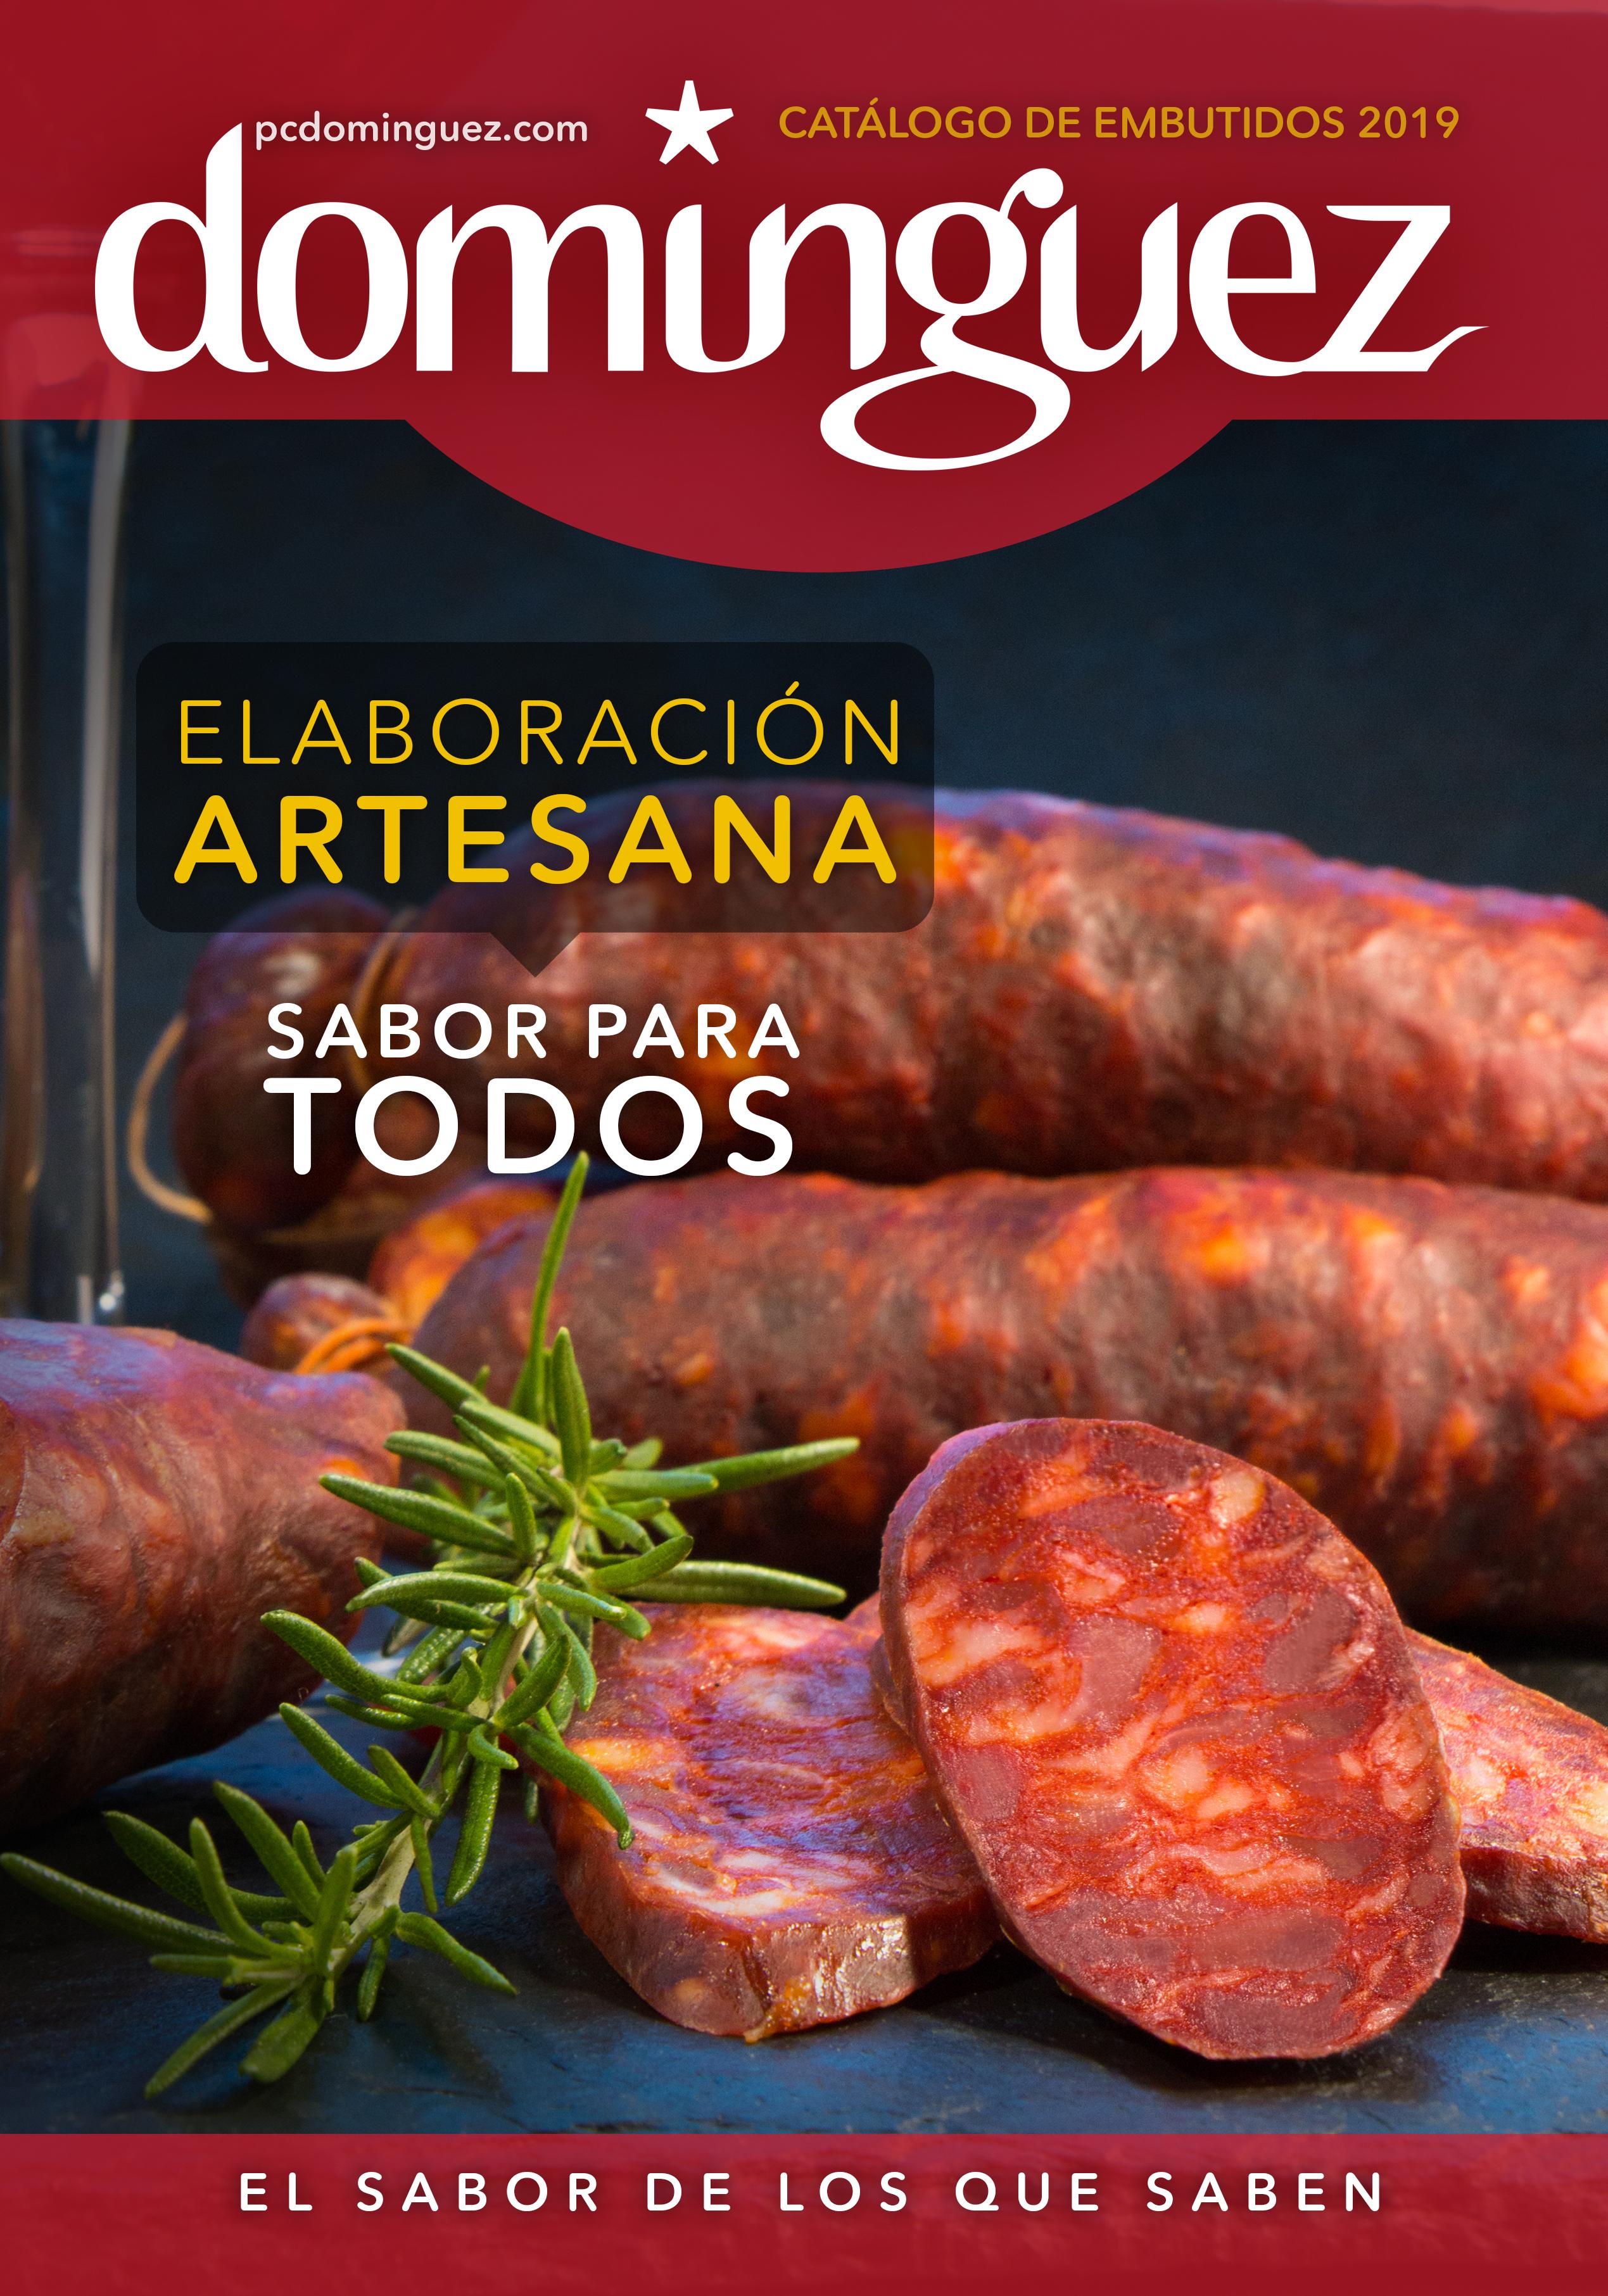 cover_embutidos_2019-1T.jpg